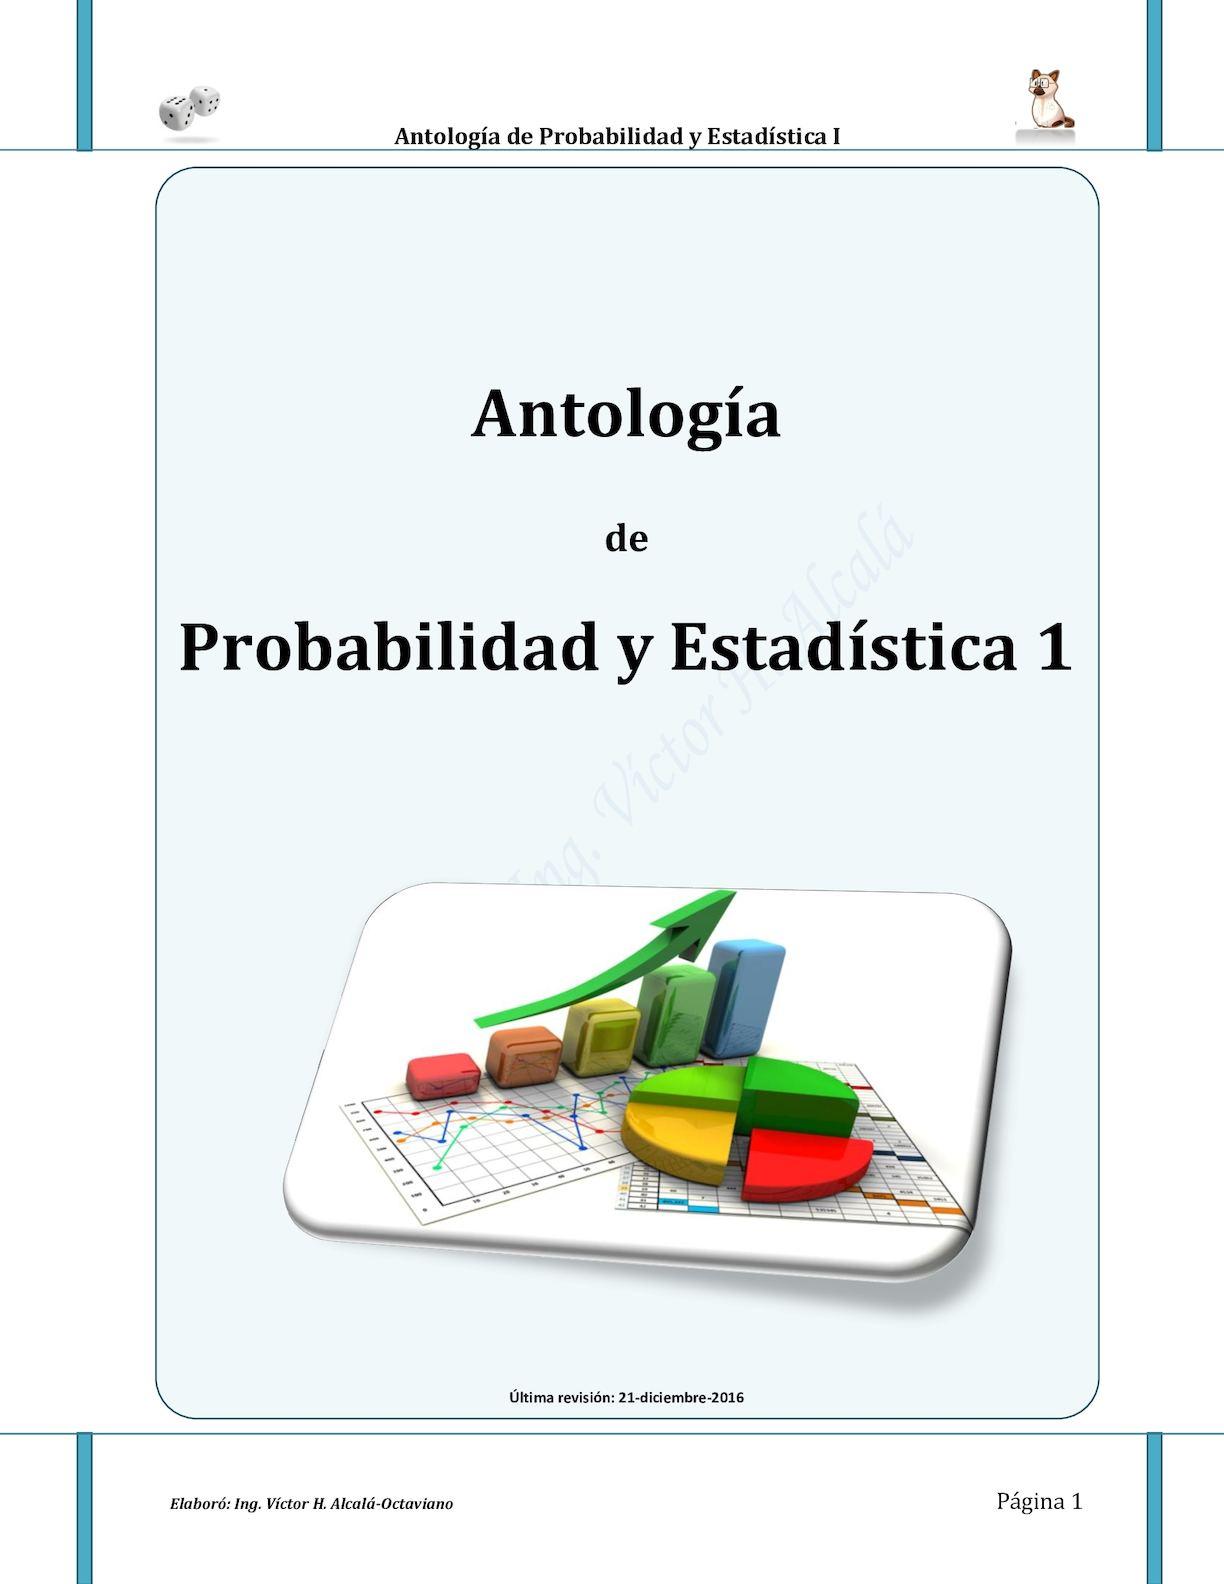 Antología Py E1 EA2017